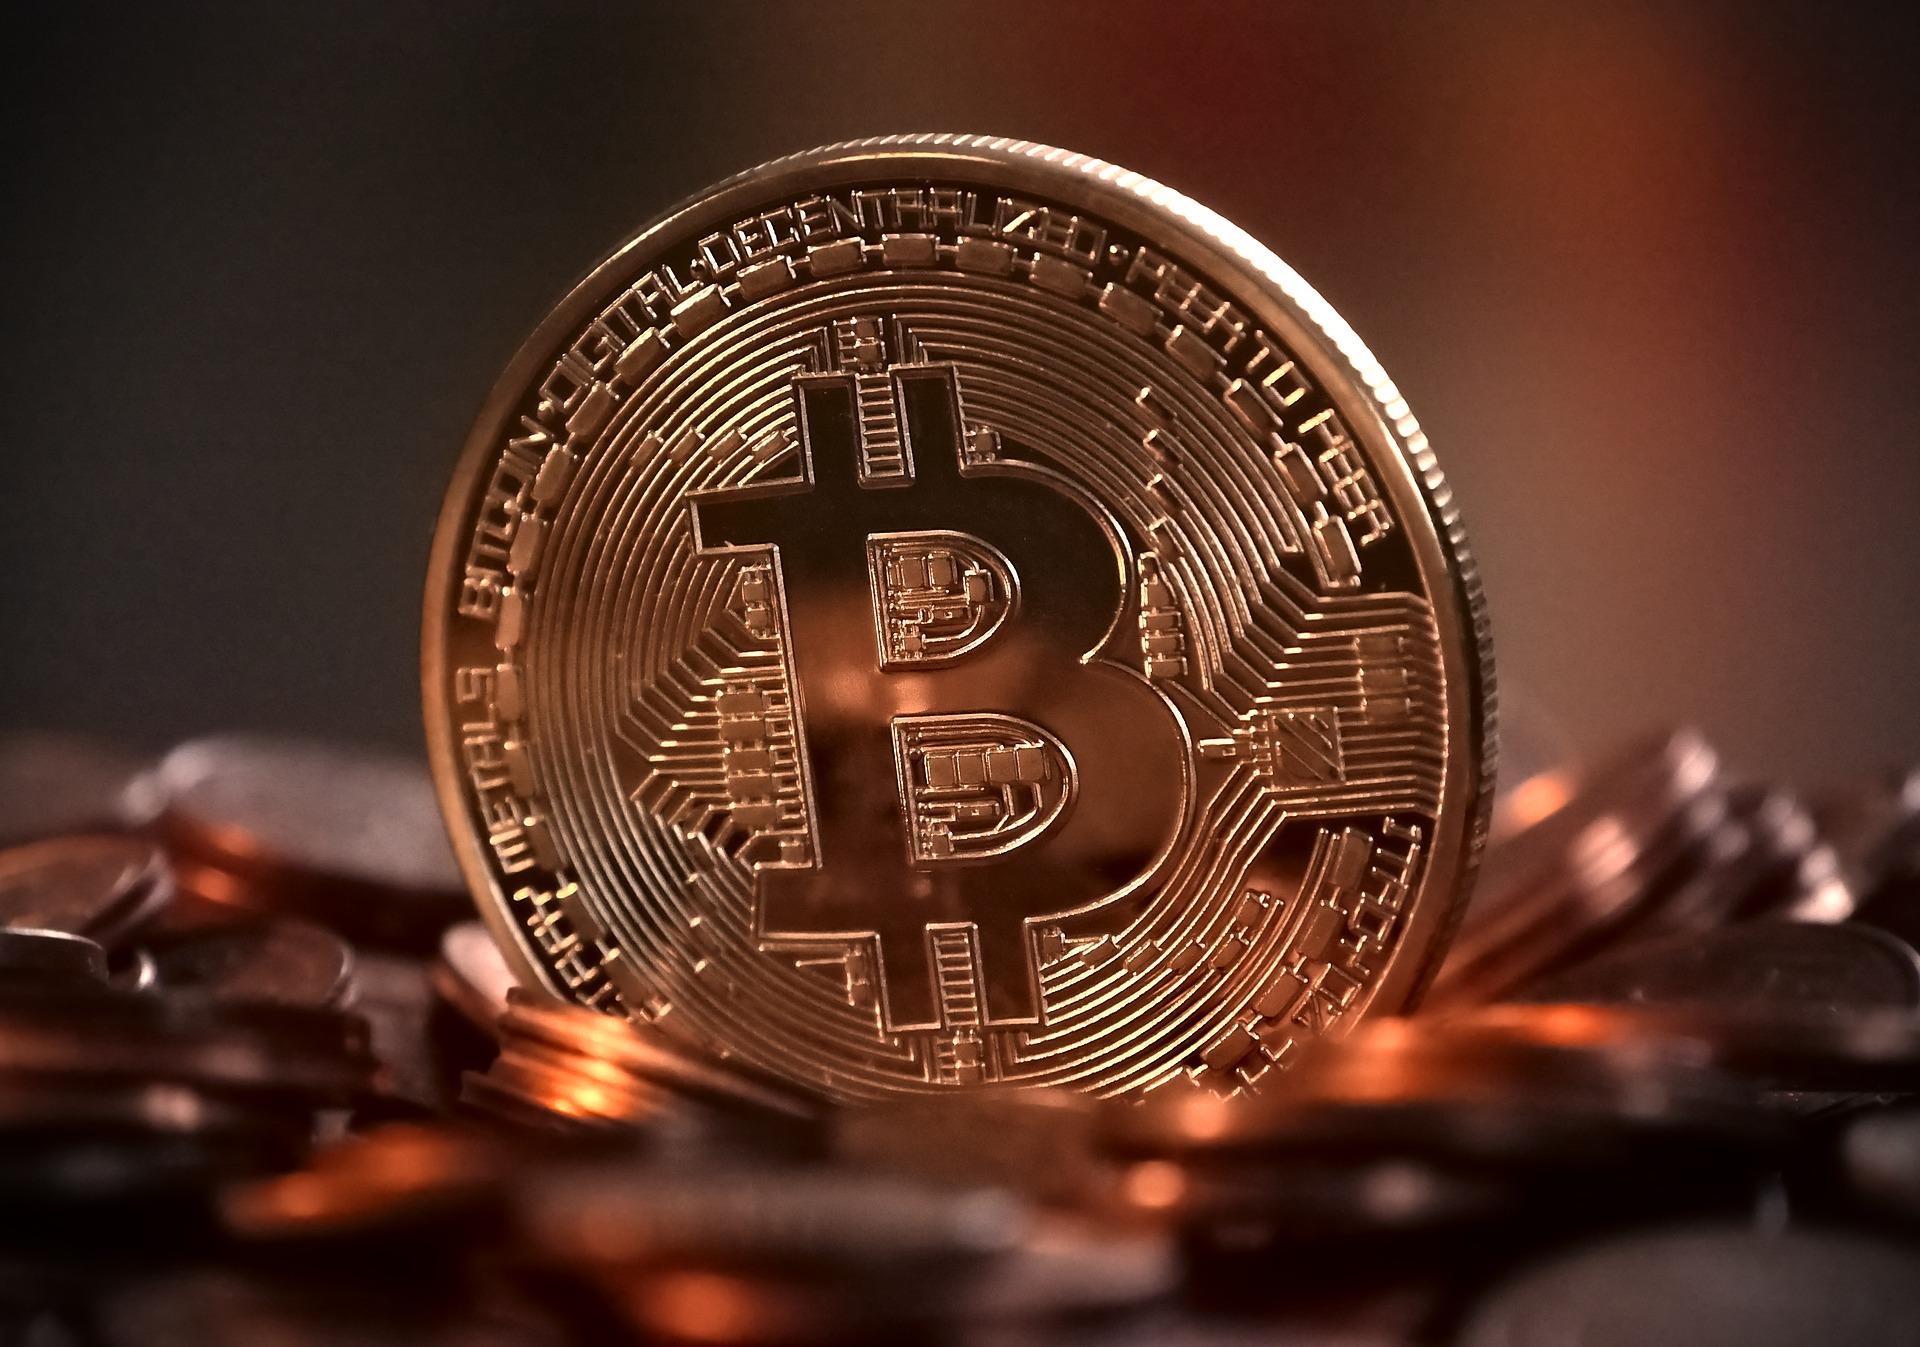 kupit bitcoin)